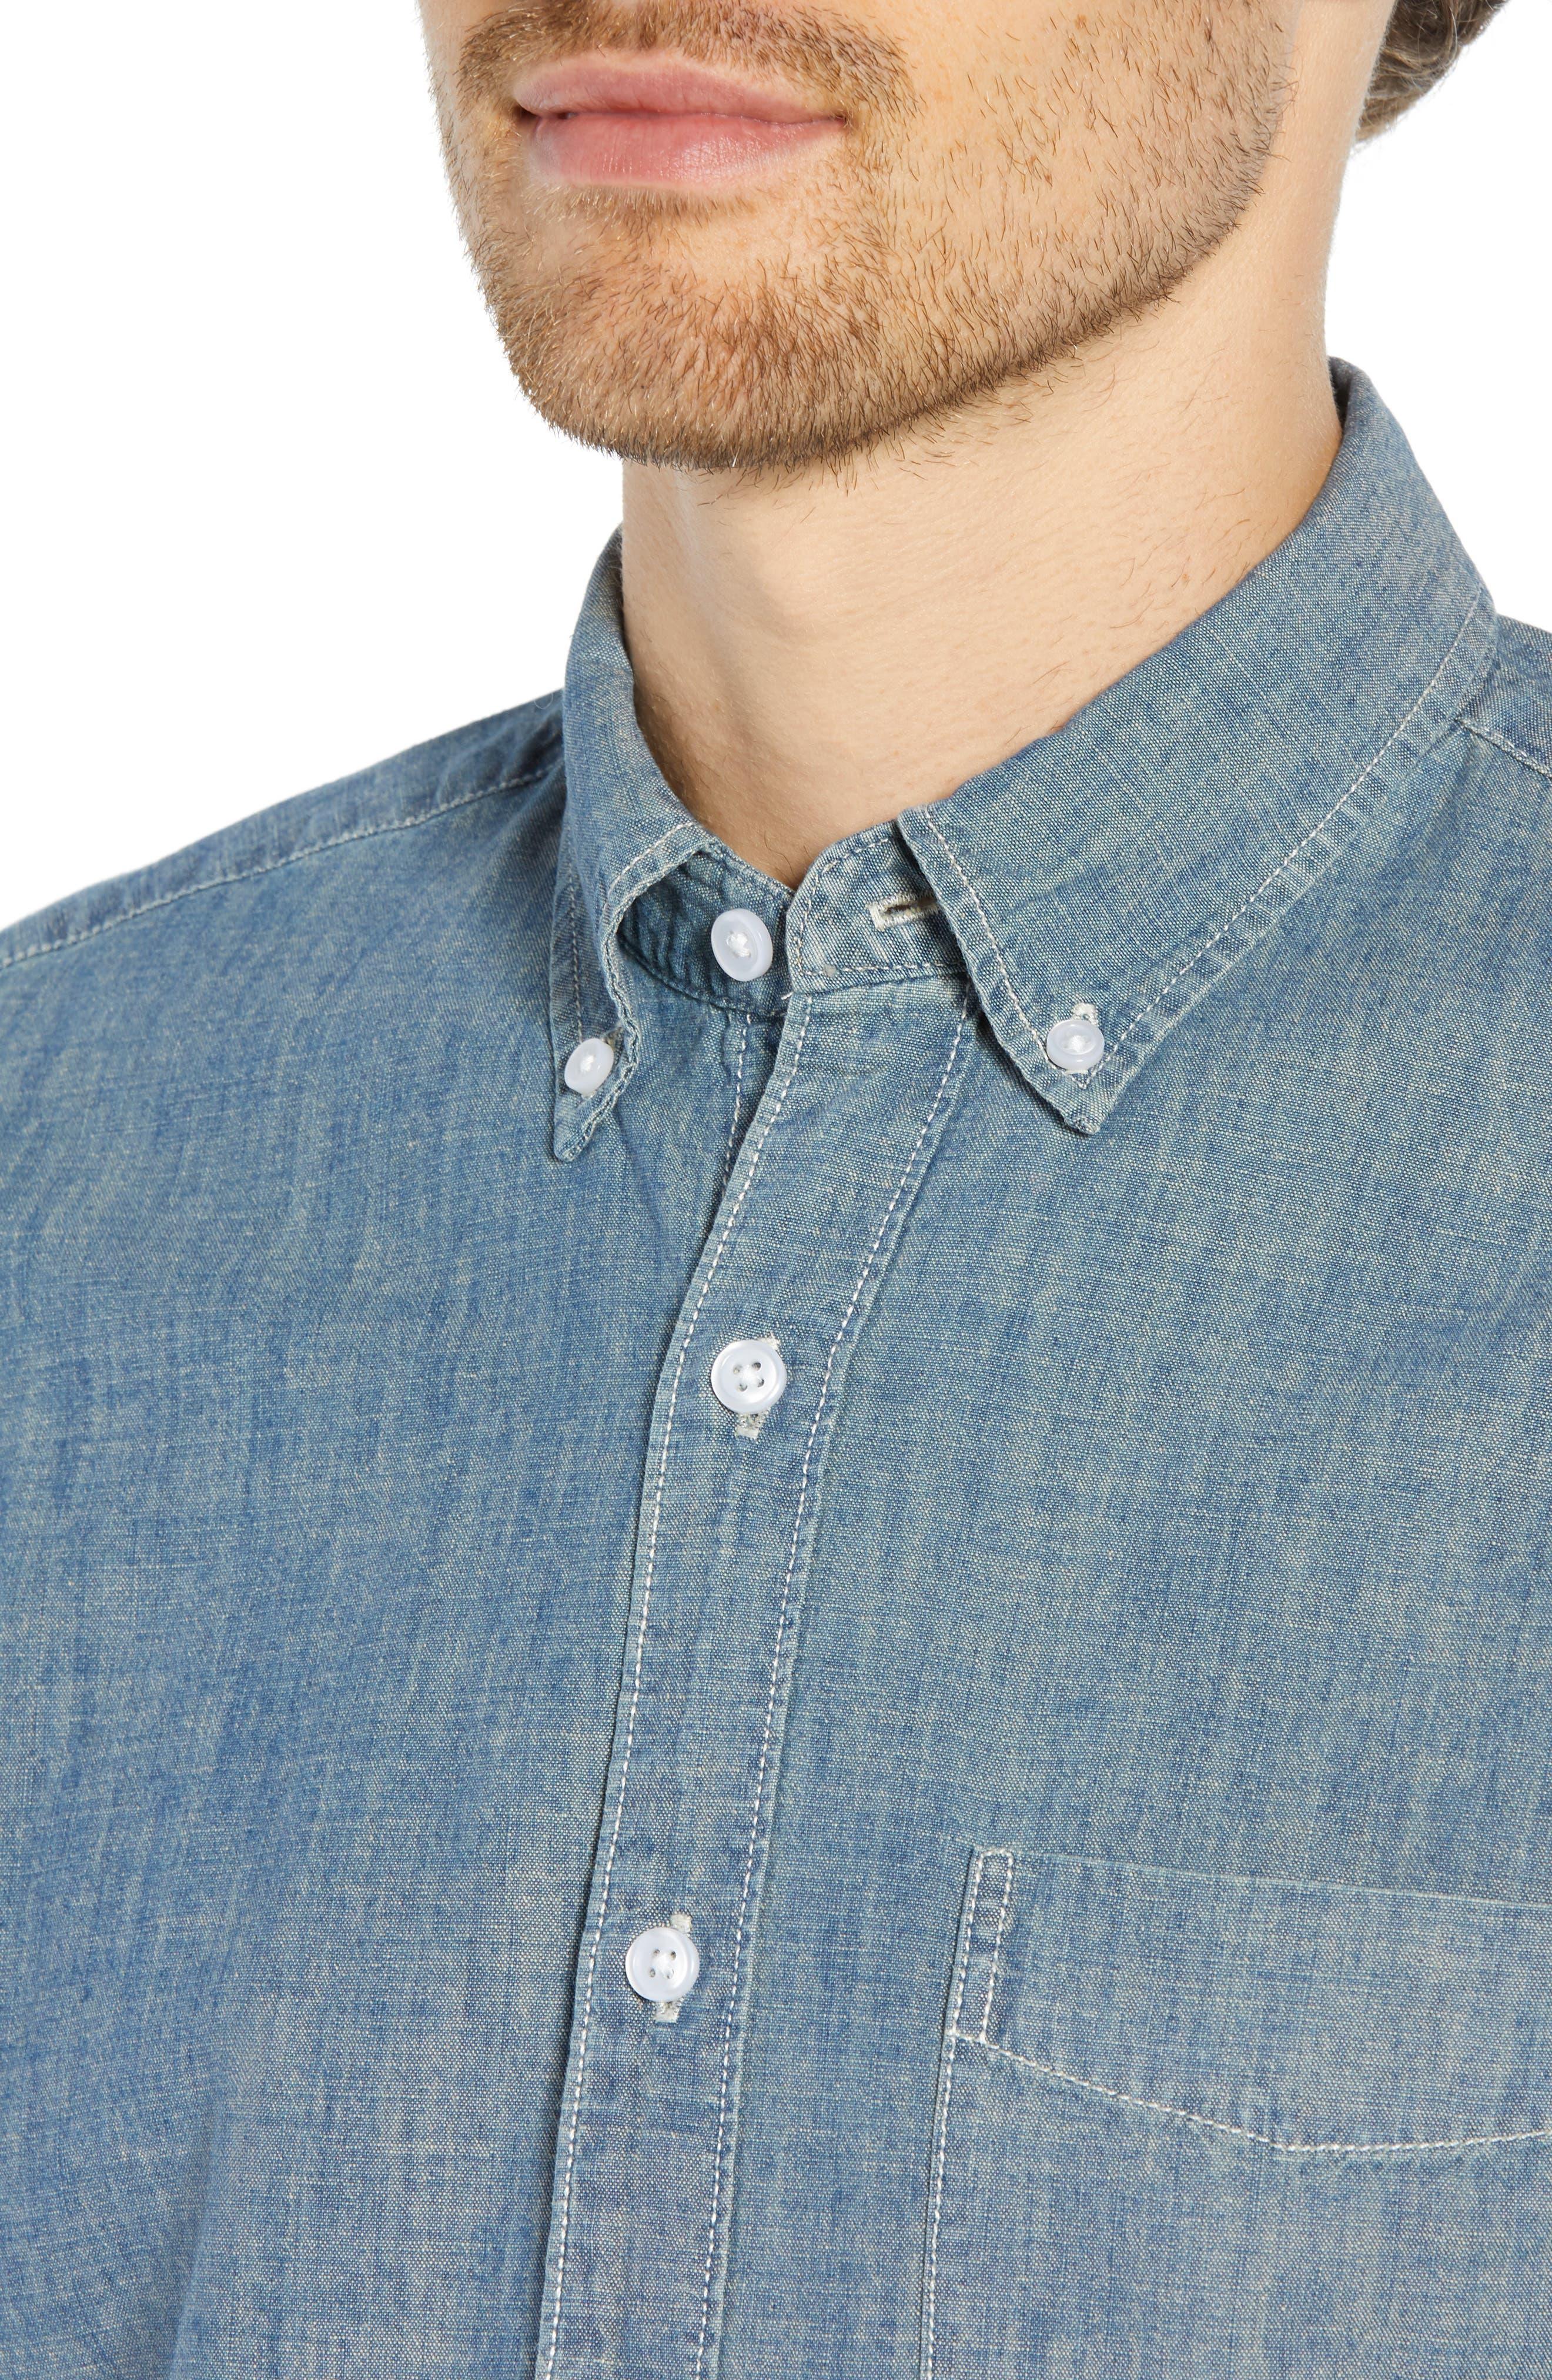 Slim Fit Indigo Japanese Chambray Shirt,                             Alternate thumbnail 2, color,                             INDIGO